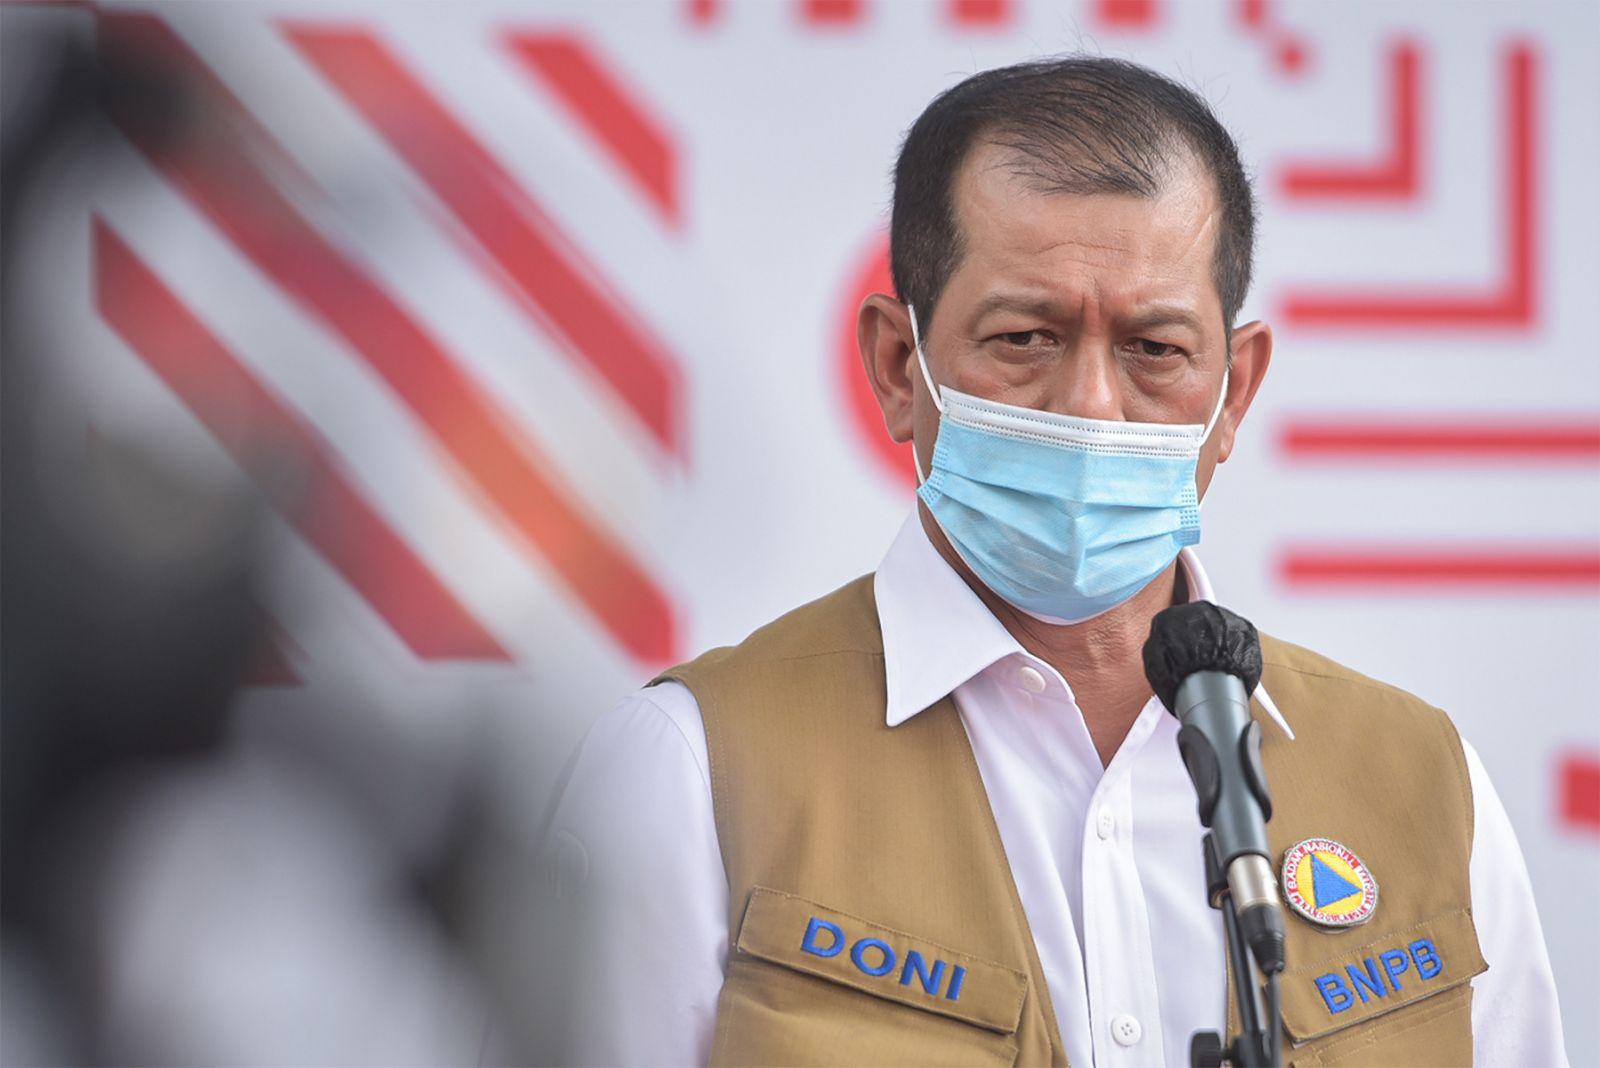 Reshuffle Memanas, Jokowi Mau Perbanyak Tokoh Top TNI (Foto: Humas Setkab)